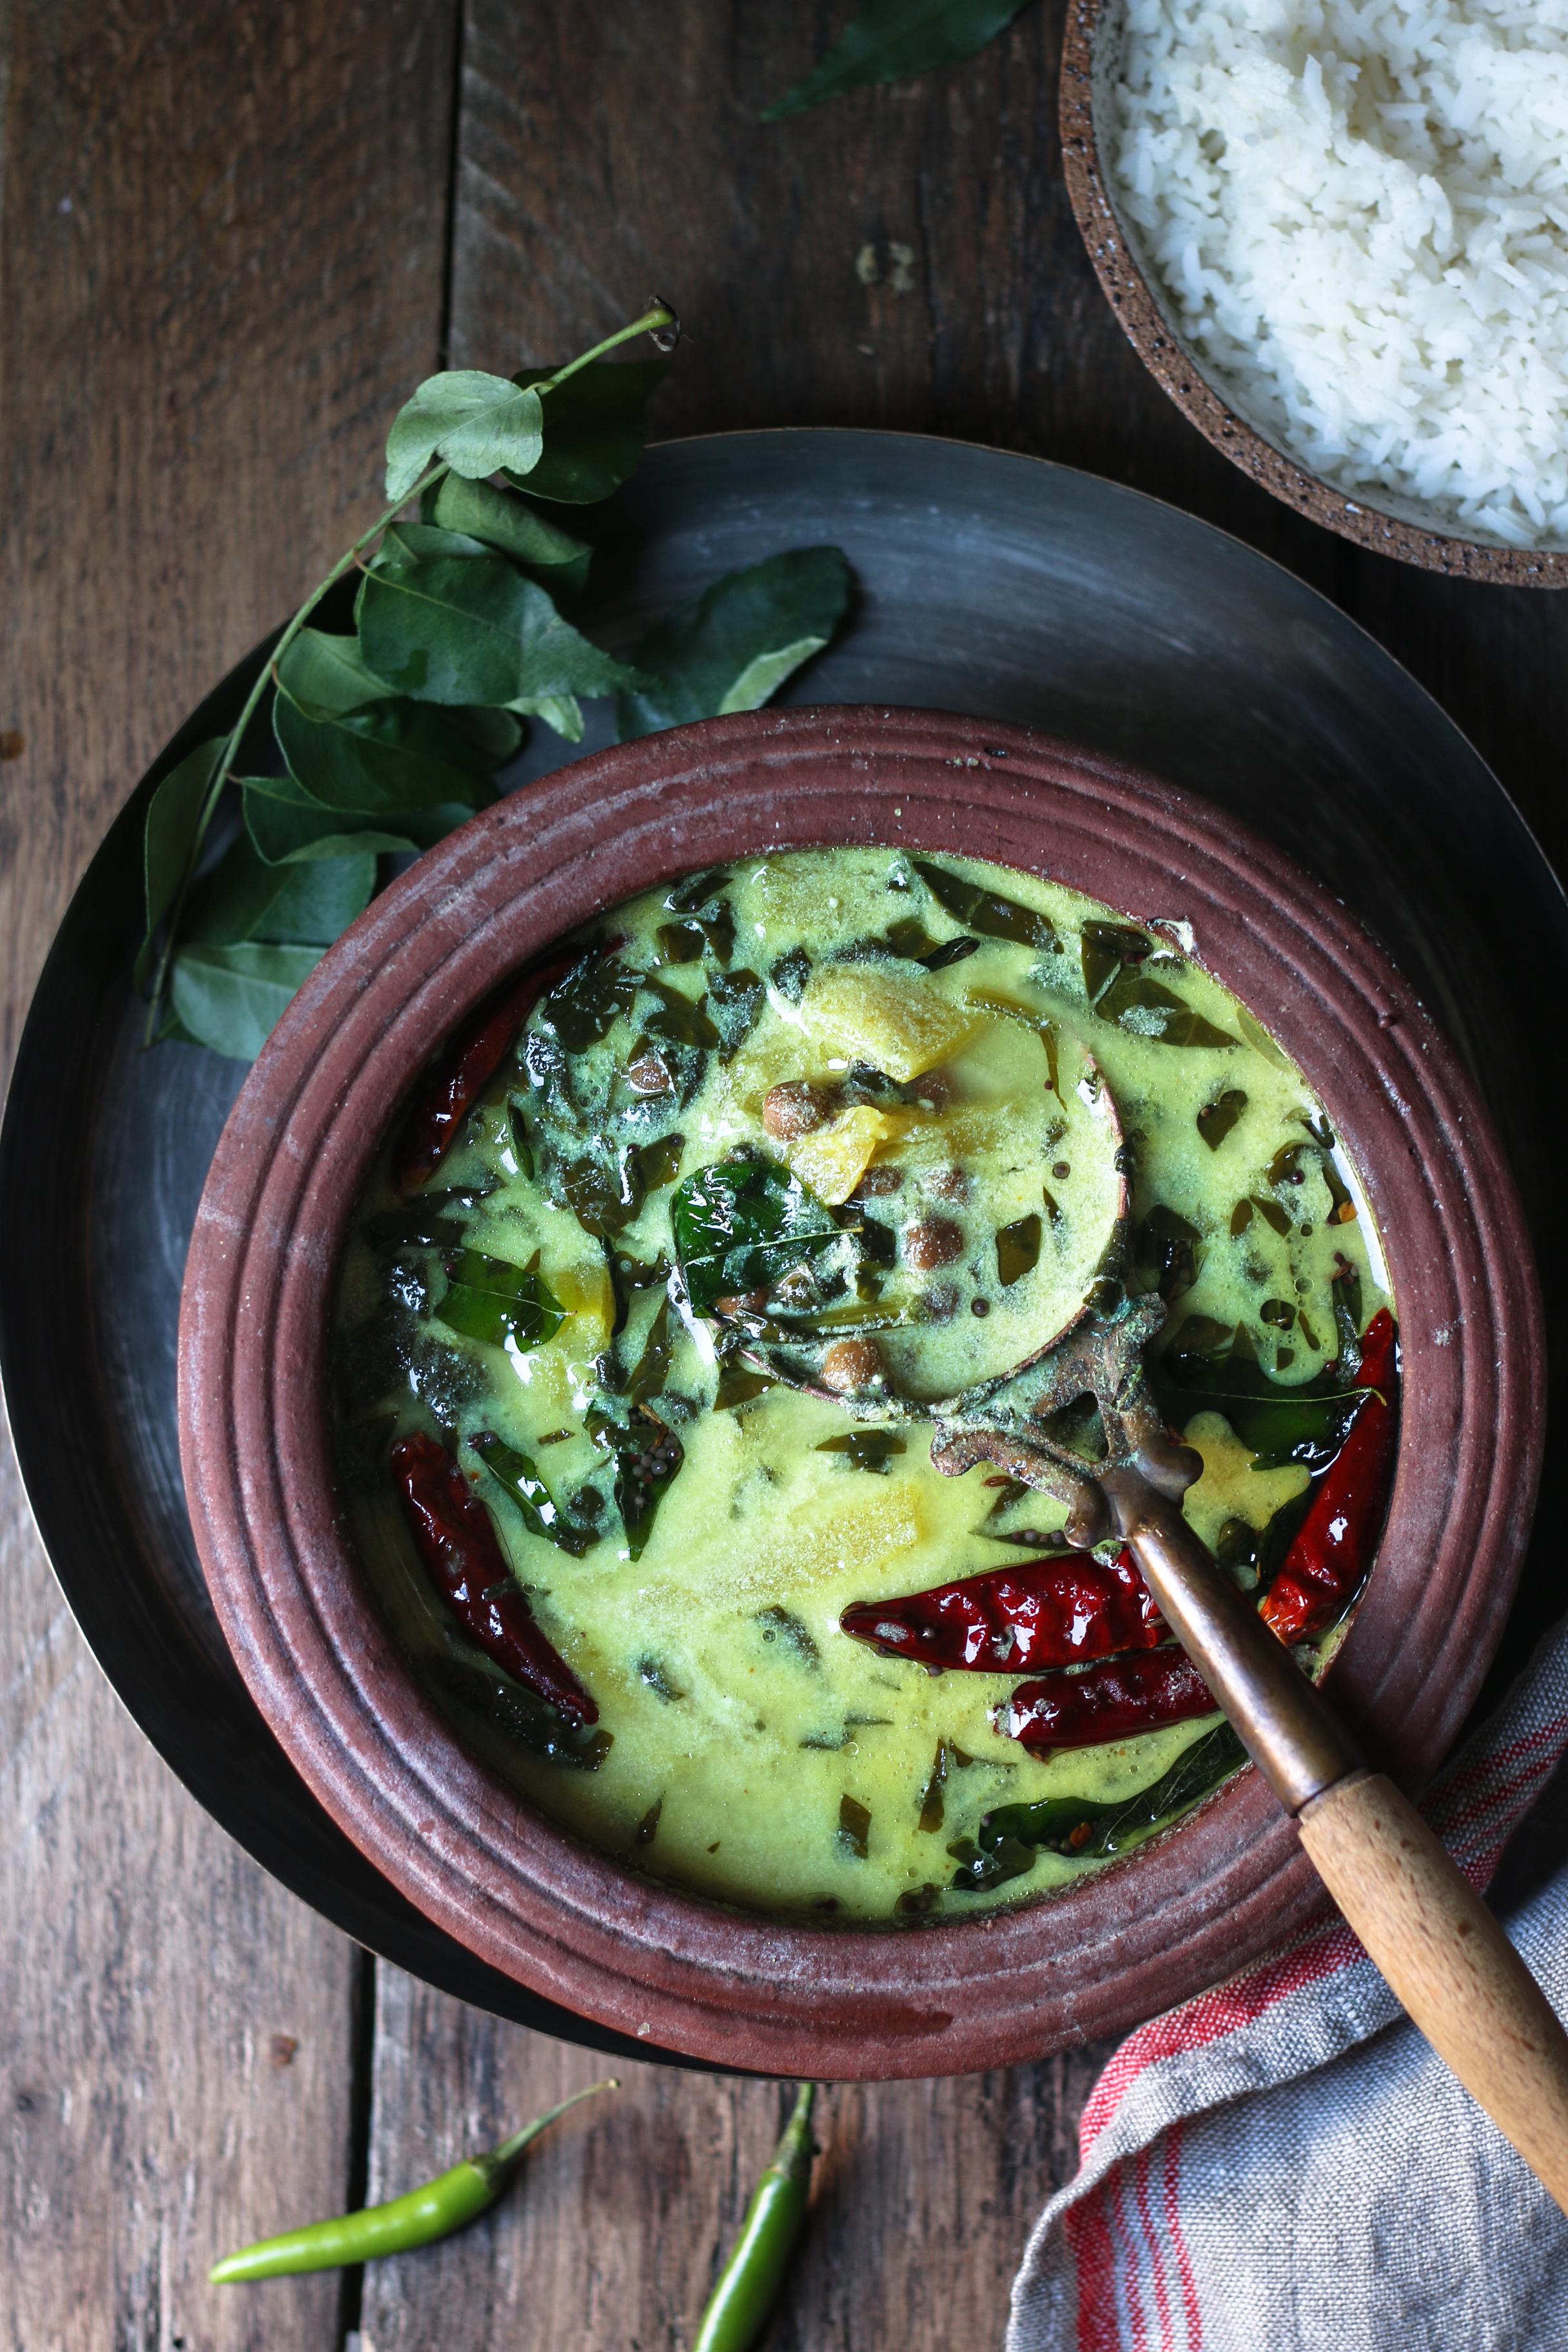 Pineapple-Black-Chickpea Spinach Yoghurt Curry aka Pineapple-kadala pulicherry/morkohumbu |foodfashionparty| #indiancurry